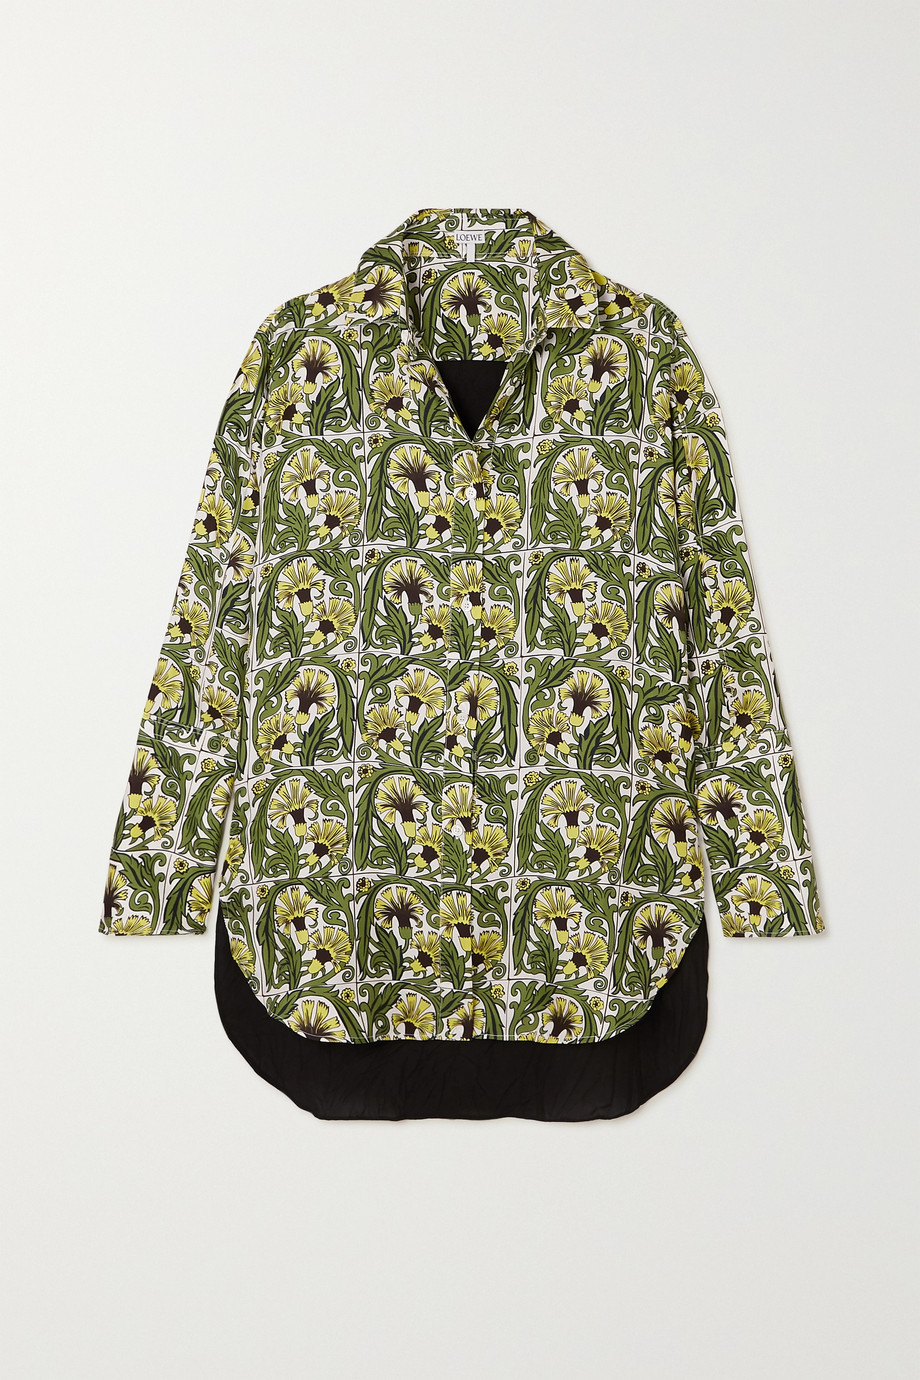 Loewe Printed silk-twill and crepe shirt